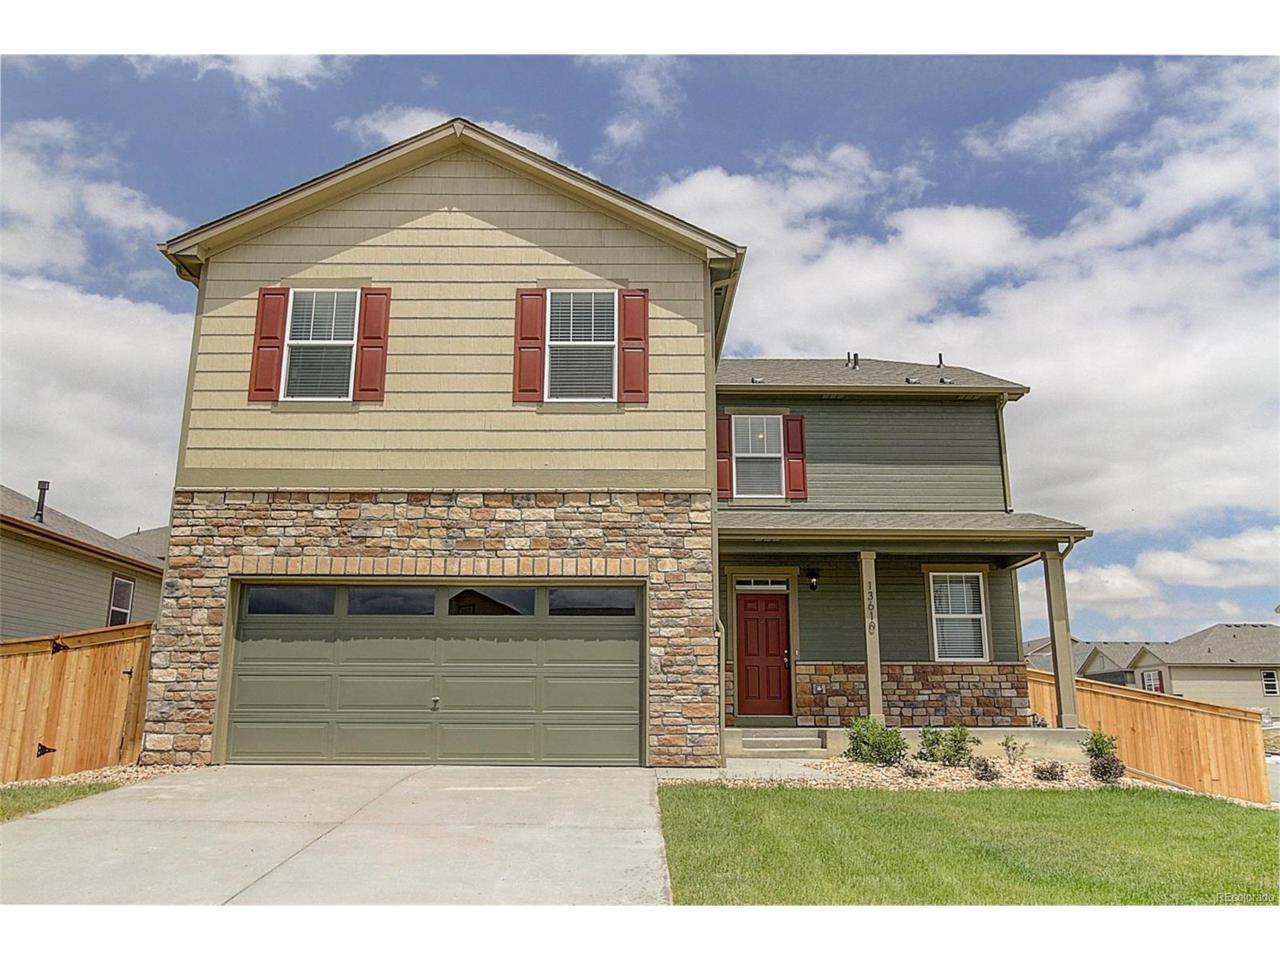 13614 Ulster Street, Thornton, CO 80602 (MLS #3006579) :: 8z Real Estate